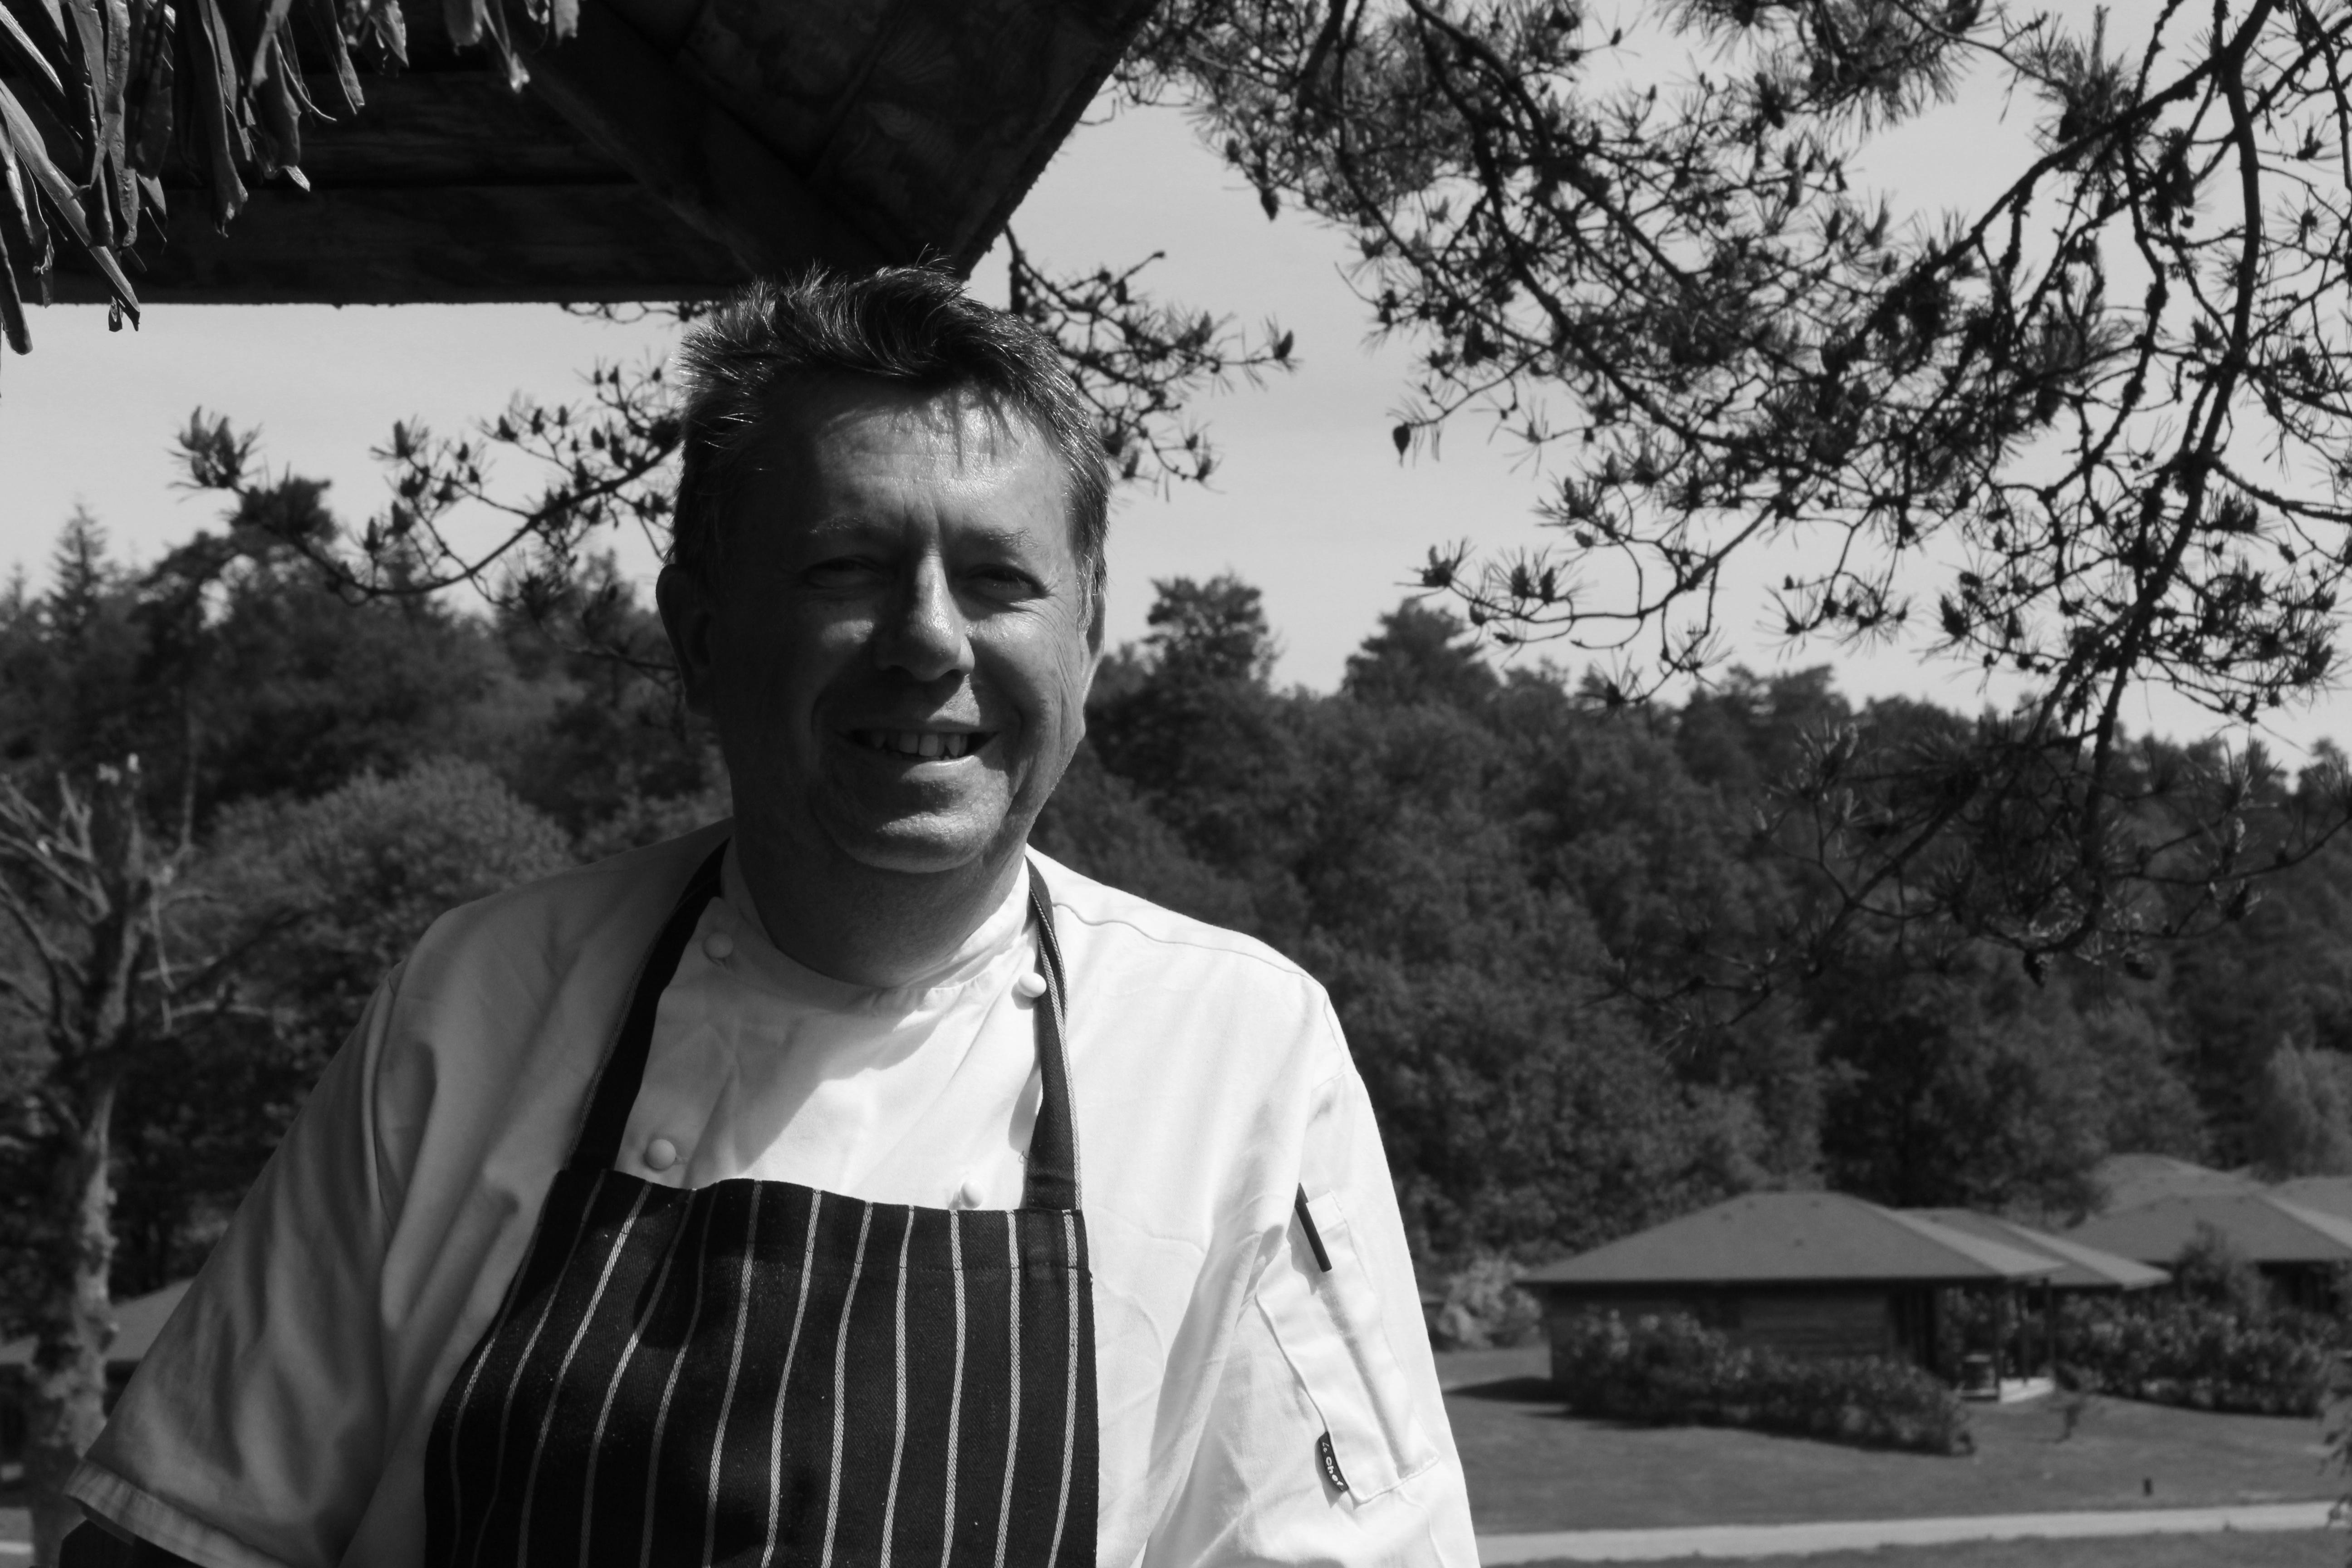 Joël cuisinier manager